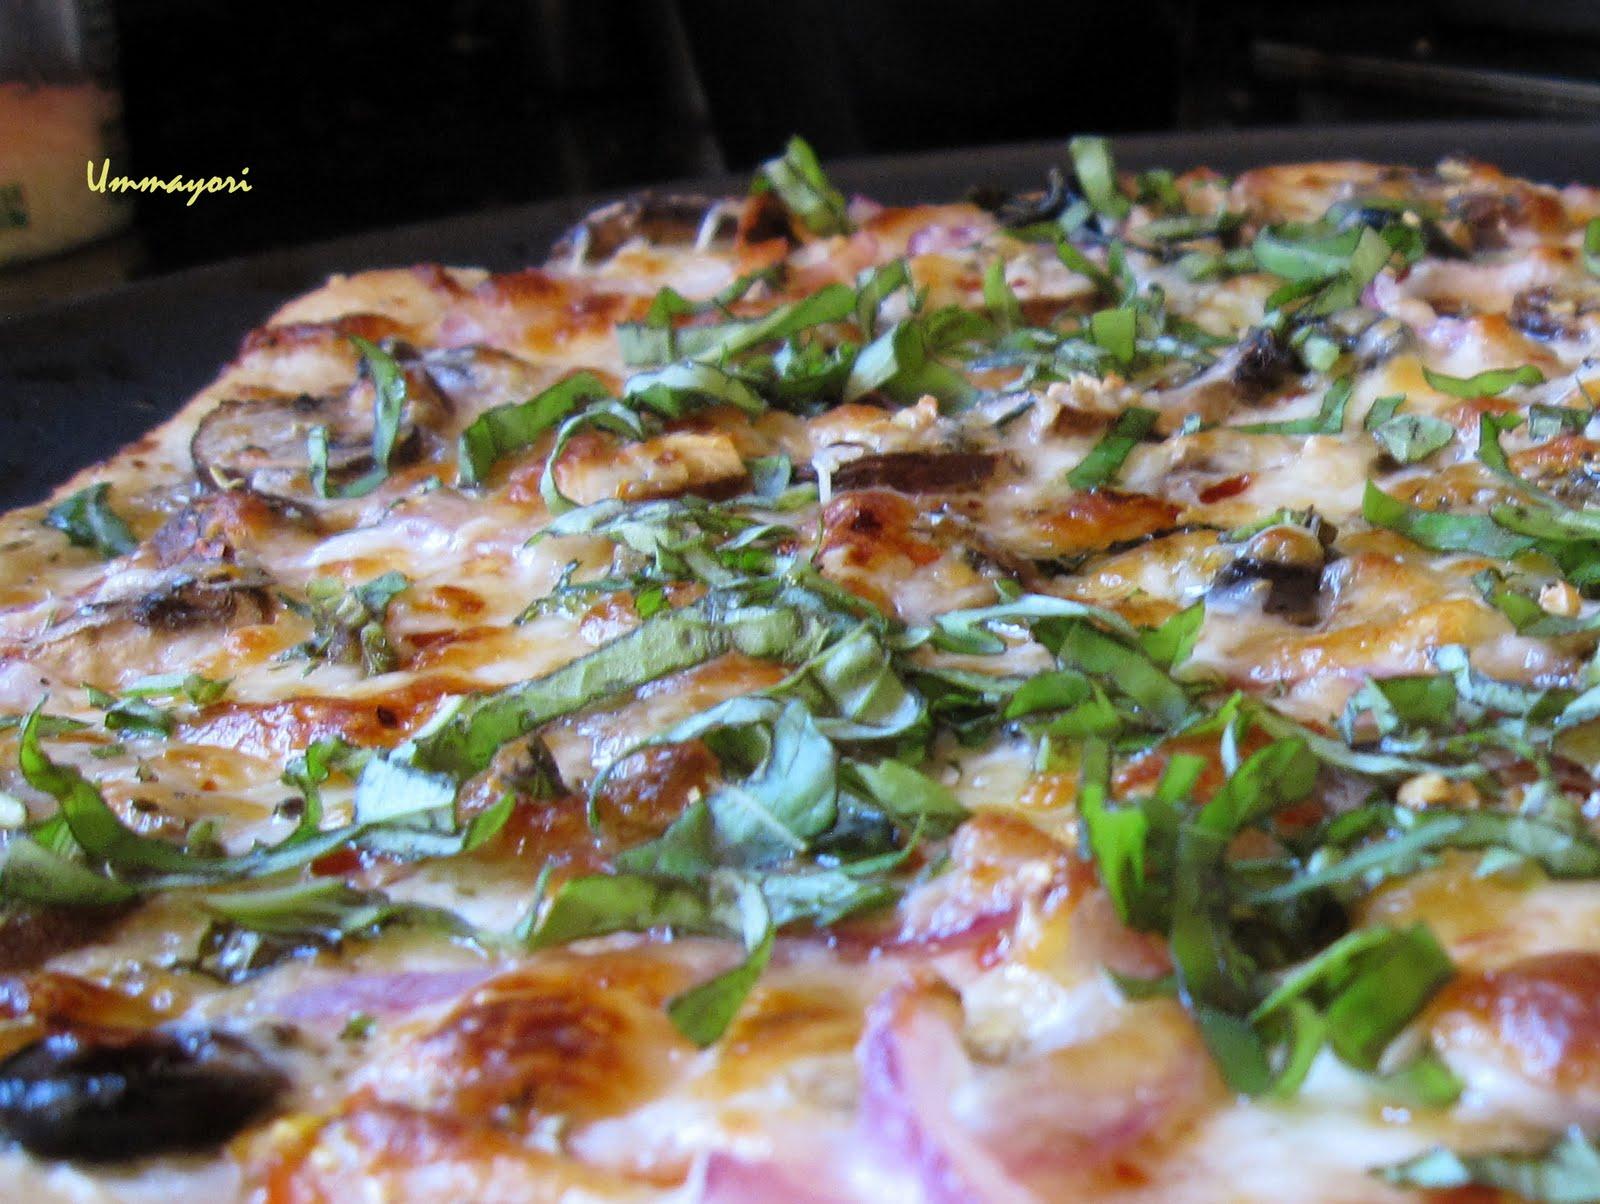 UMMA YORI: White Pizza with Fresh tomatoes and Basil